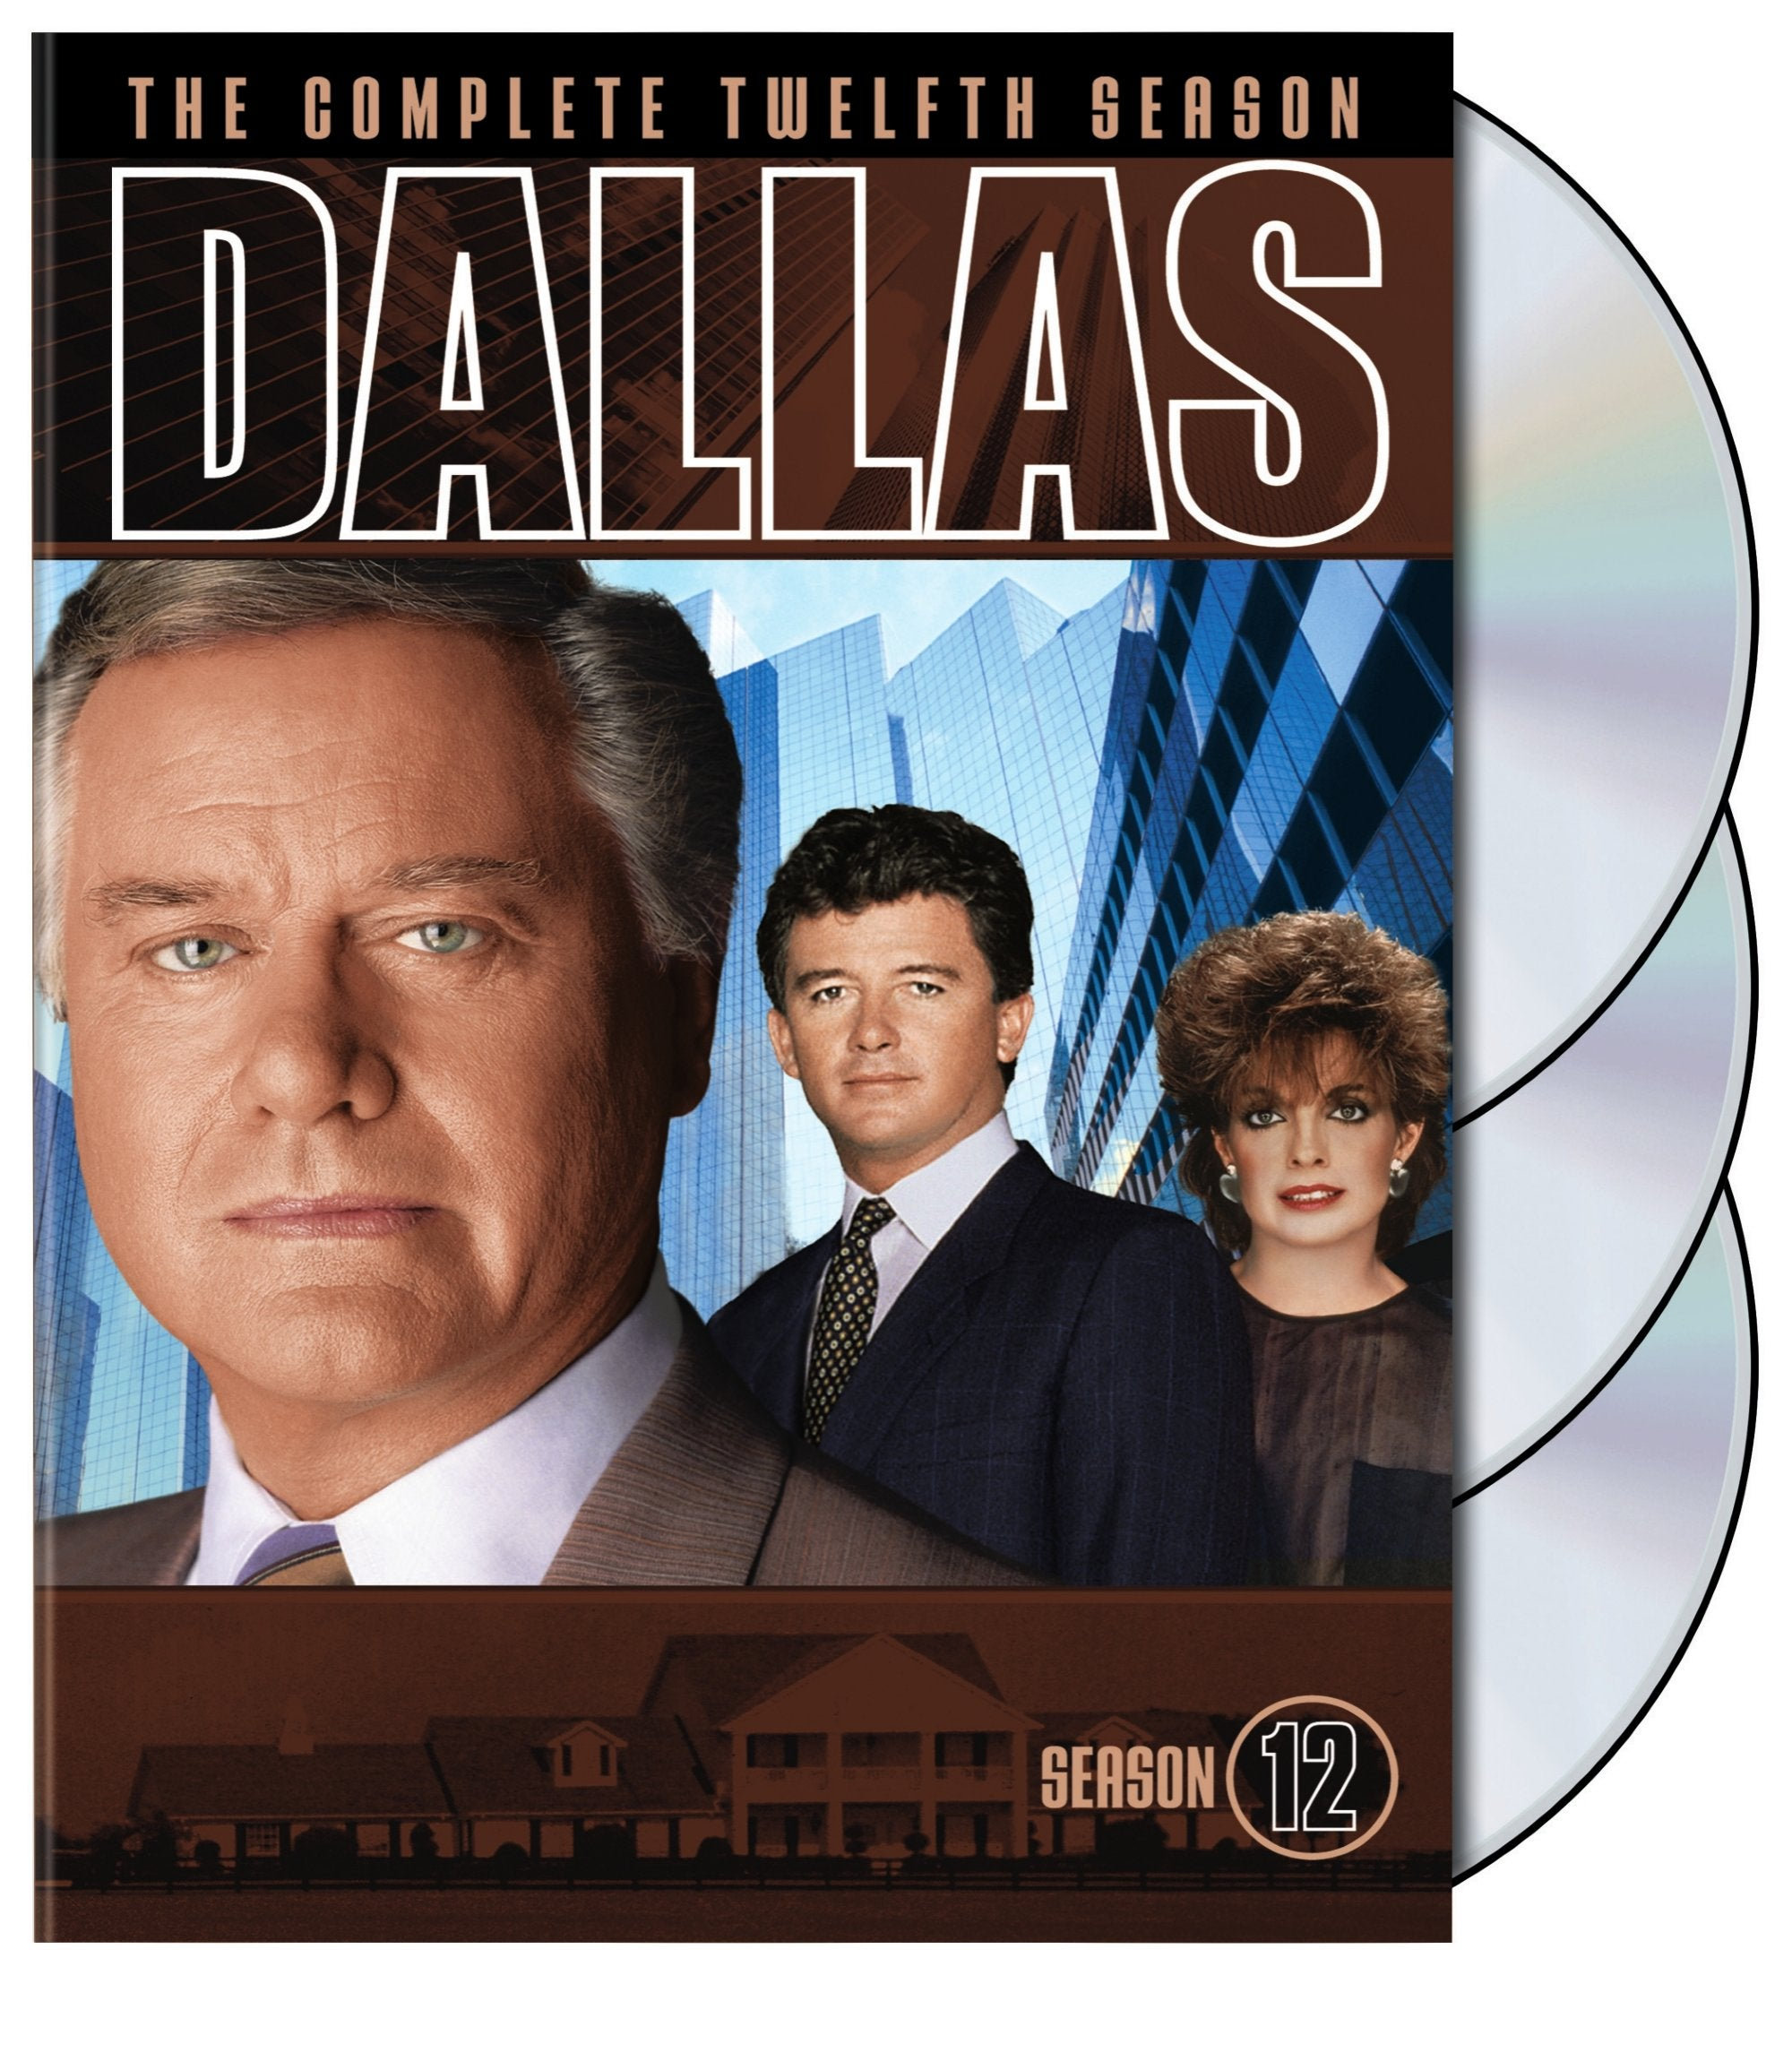 Dallas: The Complete Twelfth Season (DVD)